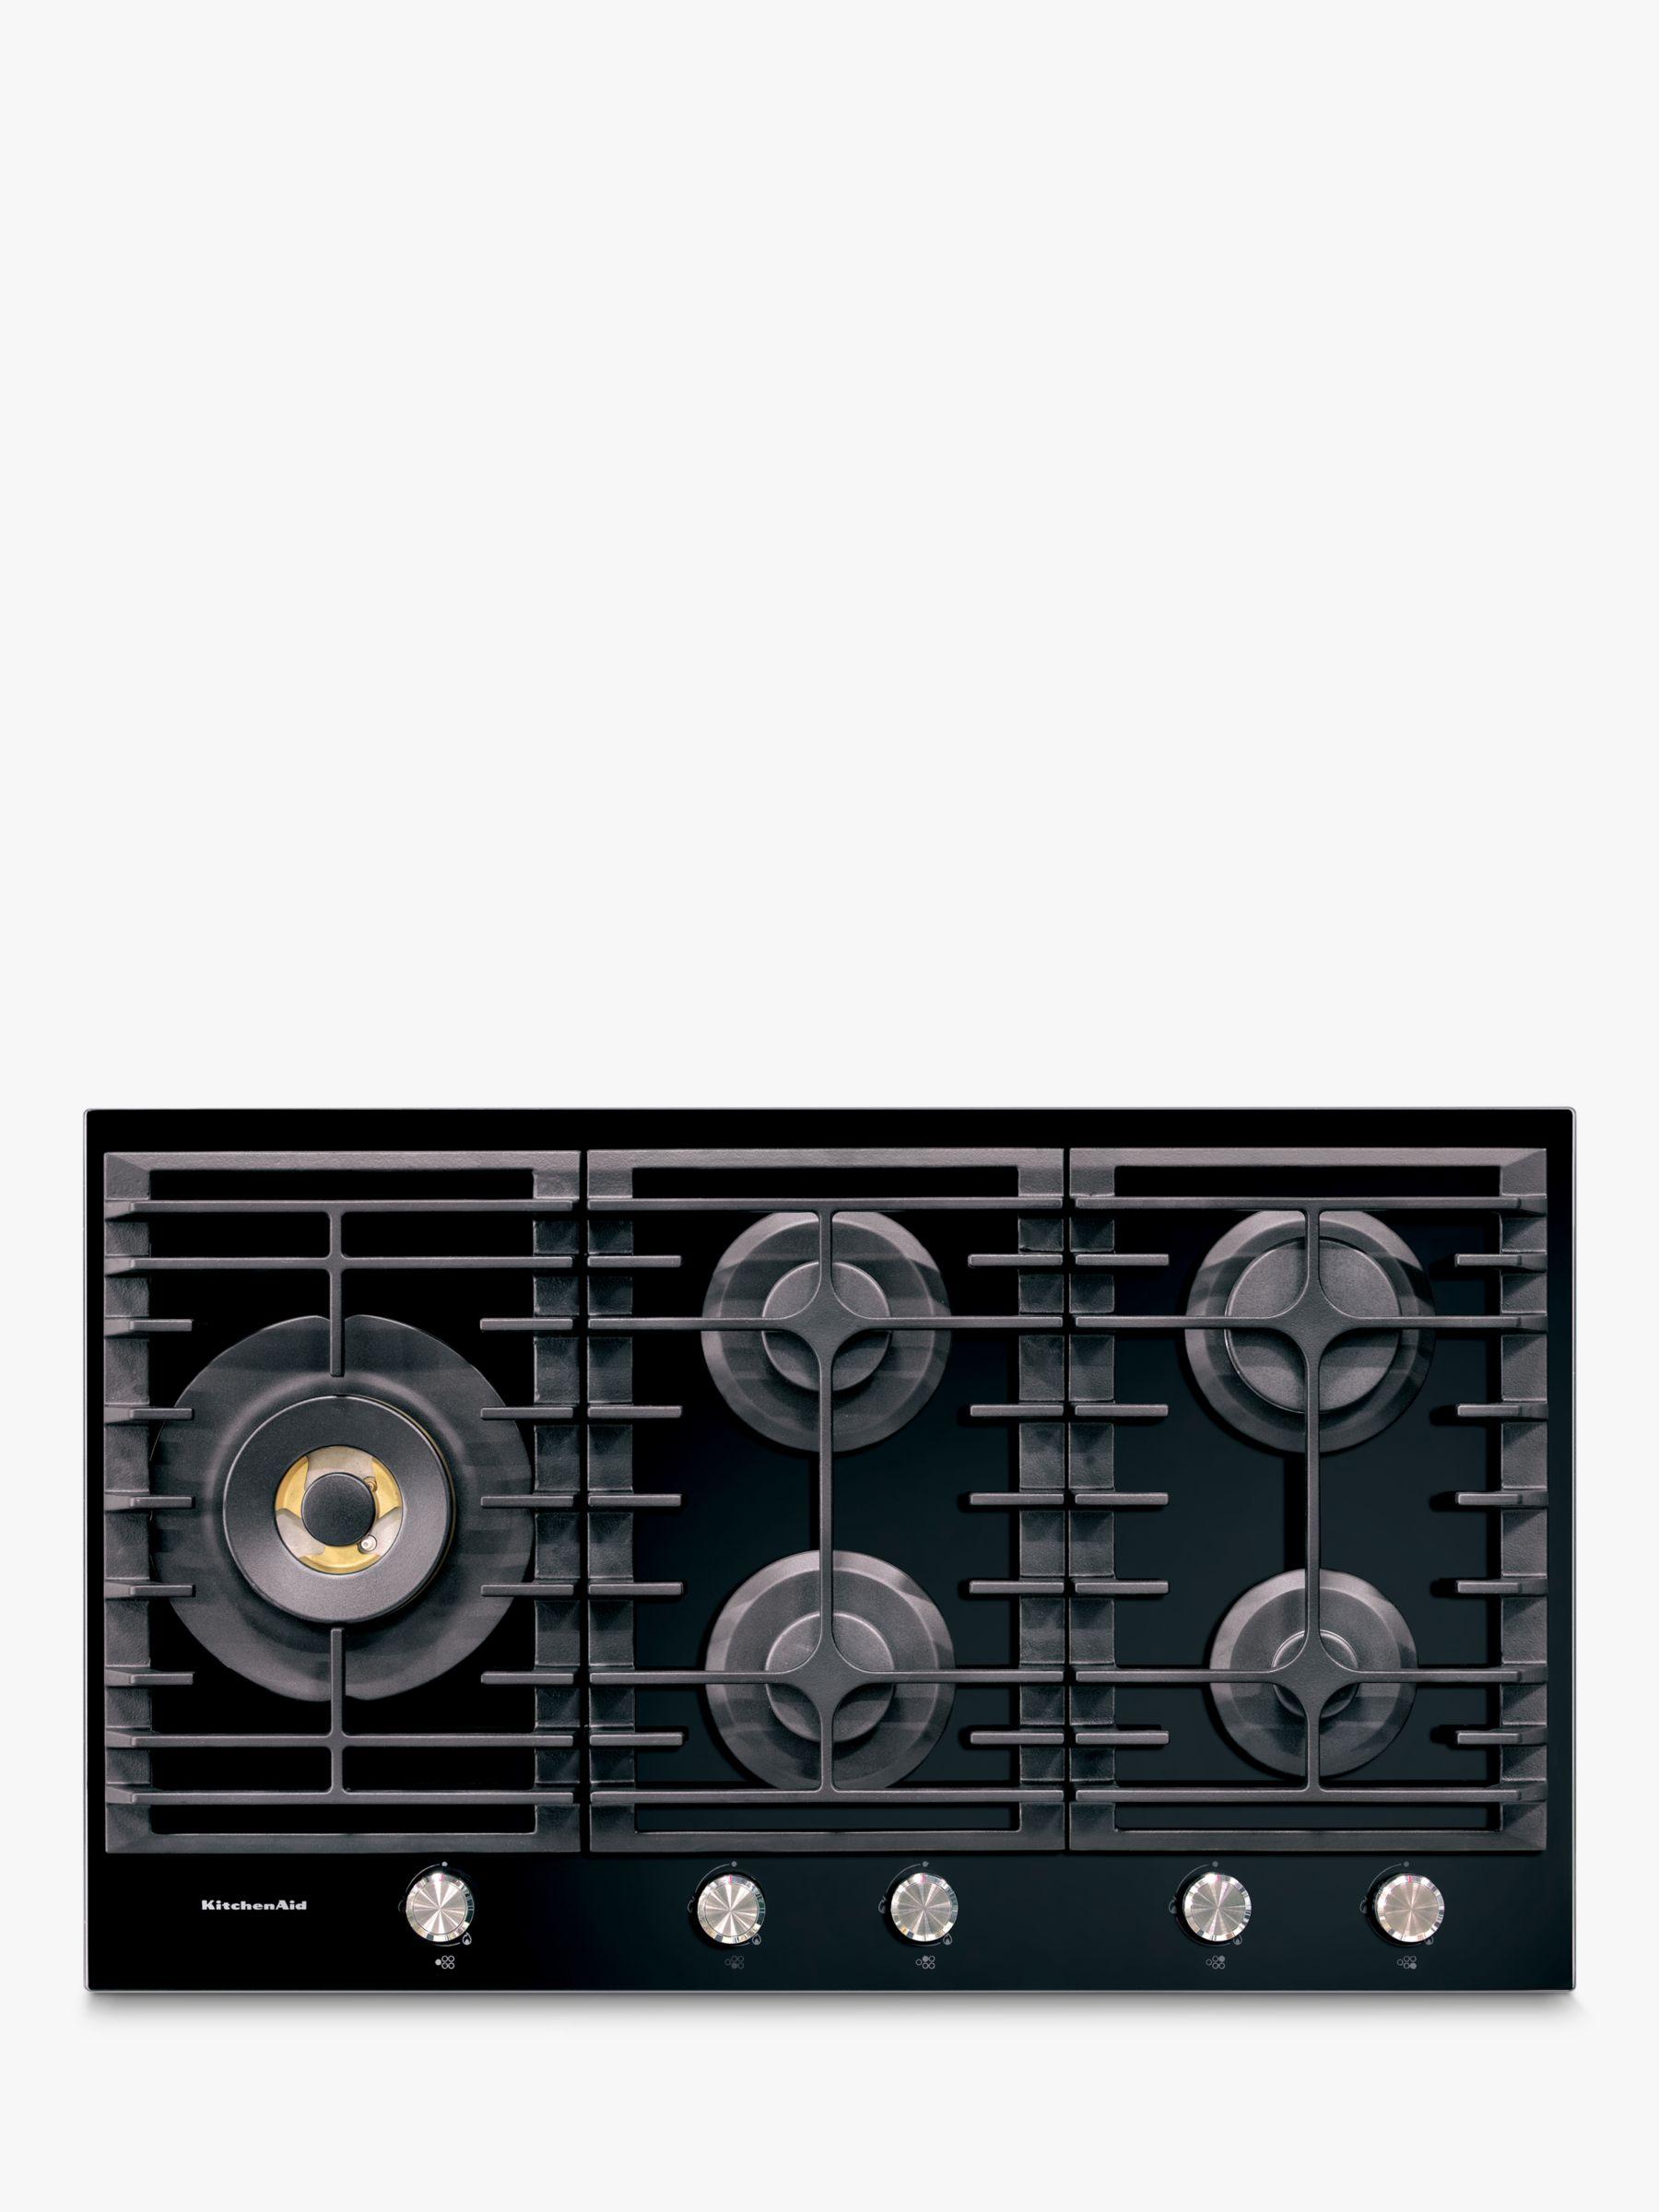 KitchenAid Kitchenaid KHGD5 Integrated Gas Hob, Black